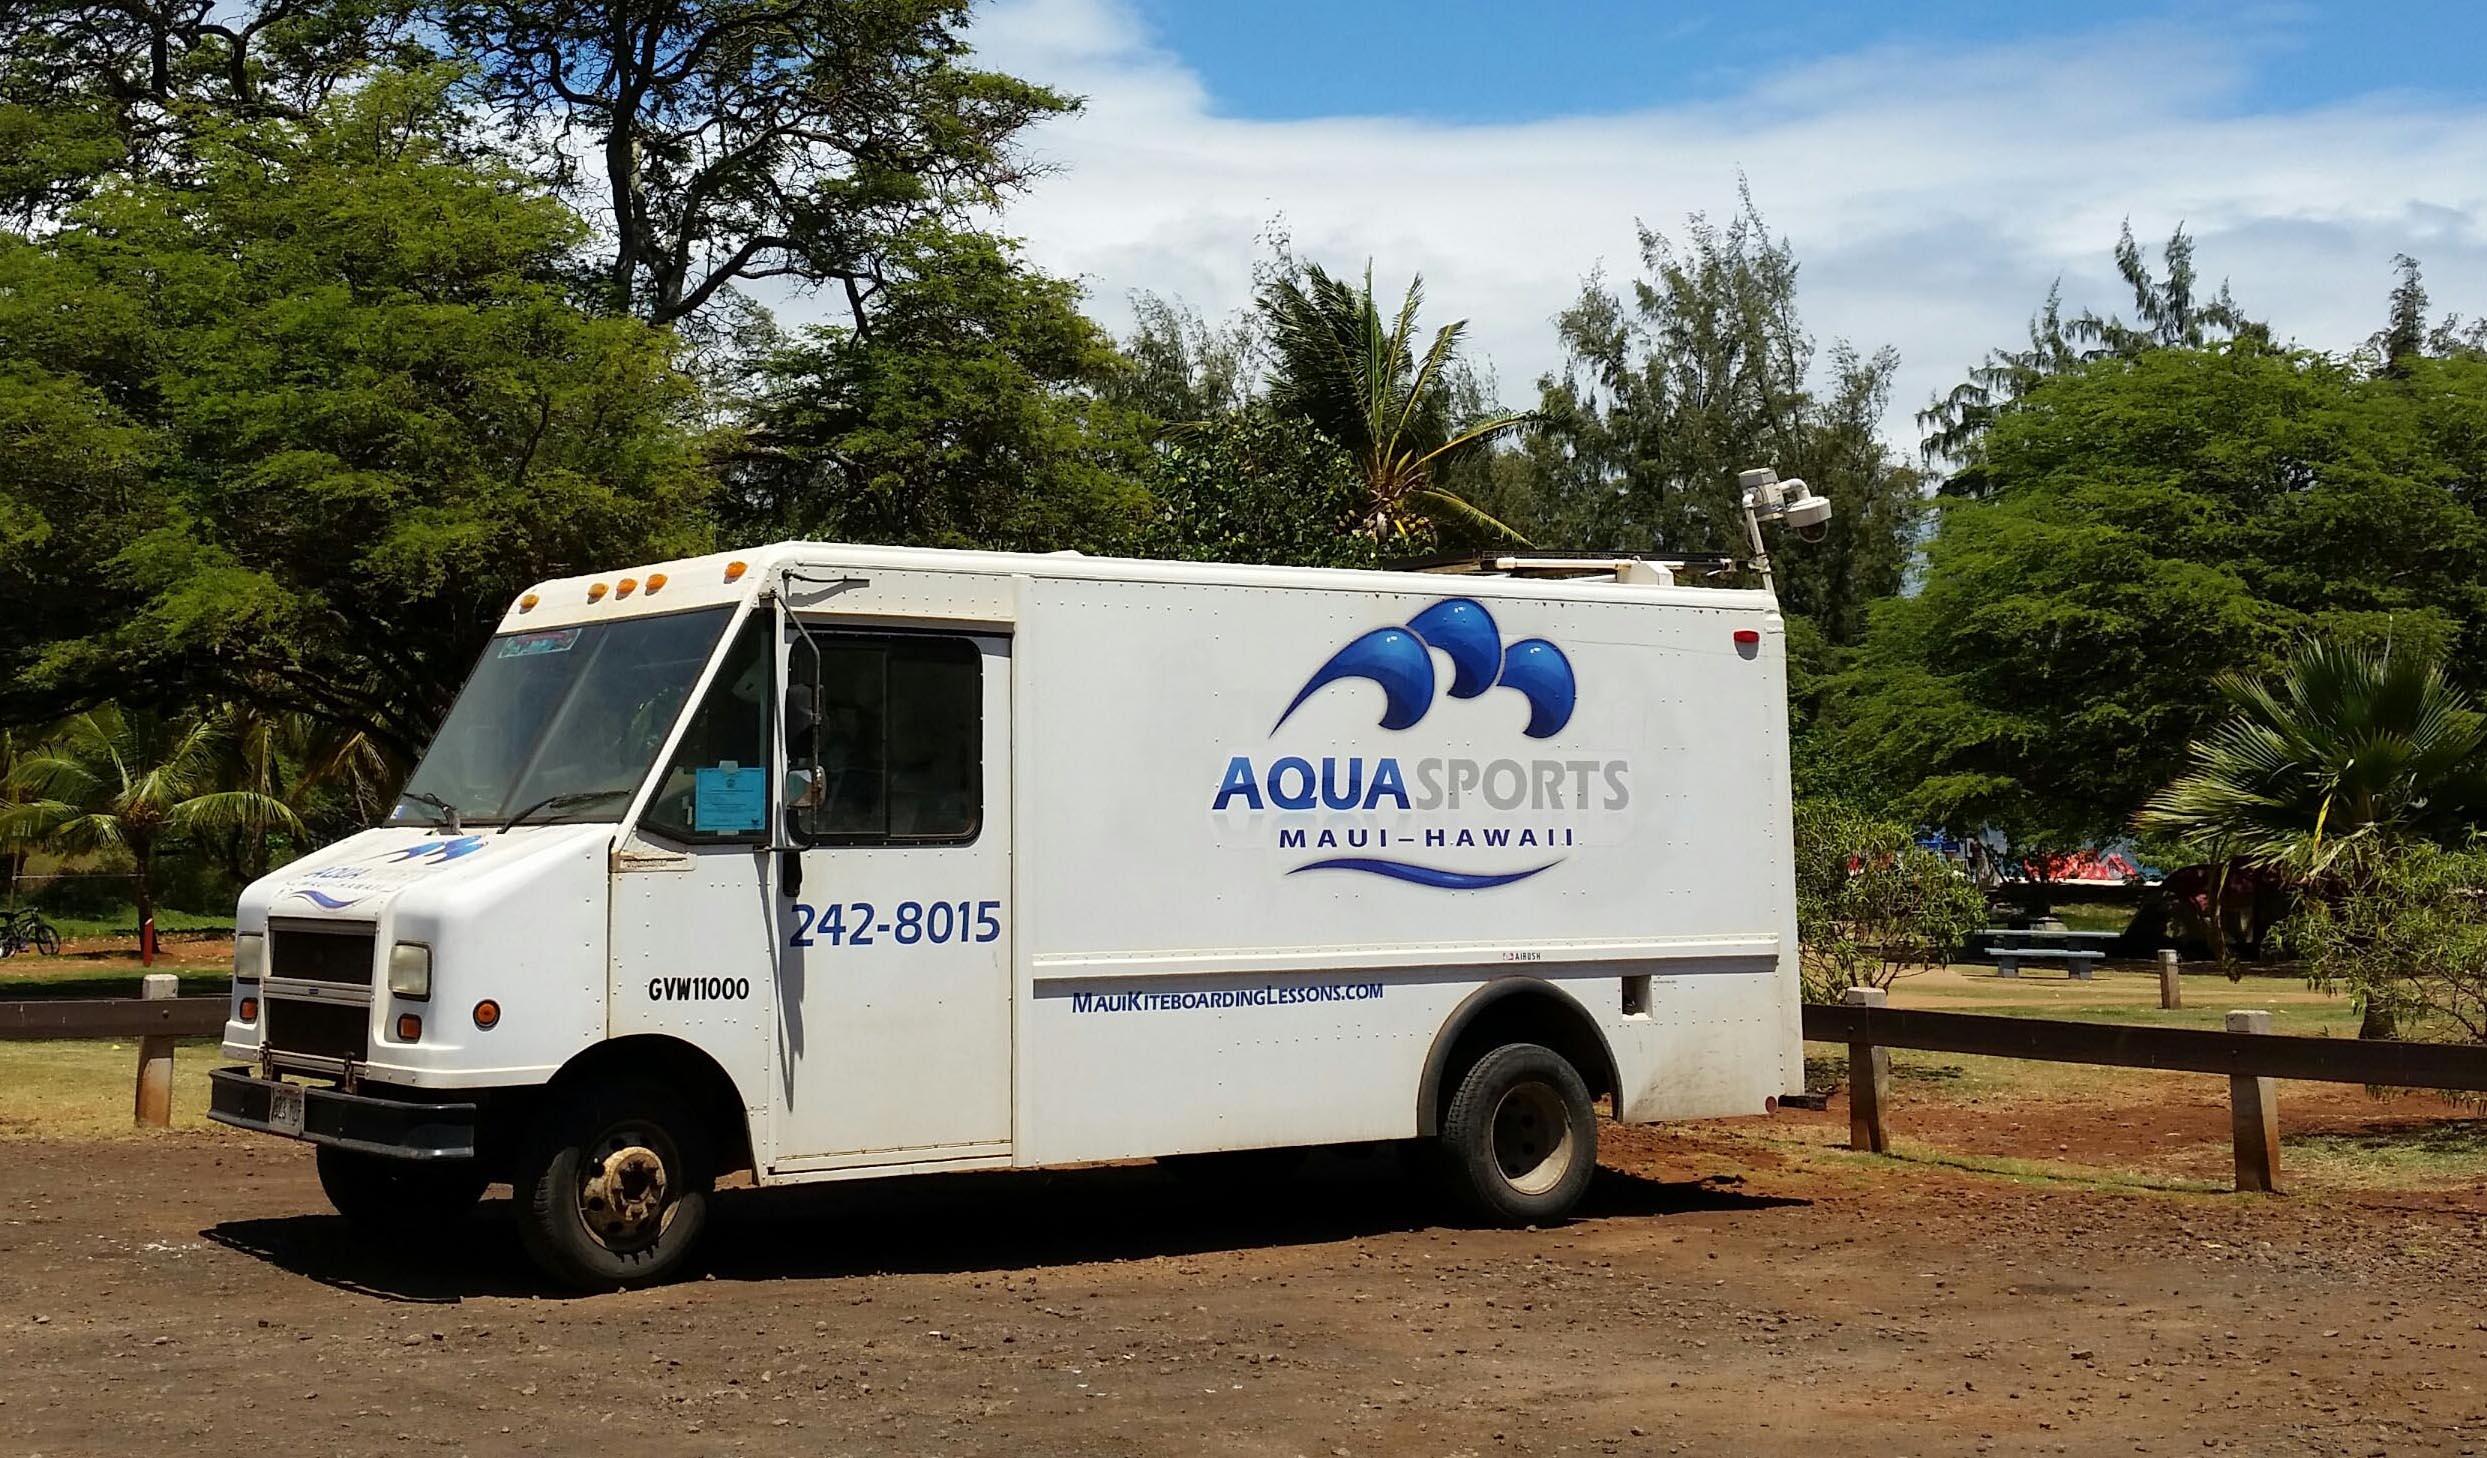 Aqua Sports Maui Kiteboarding Lessons van